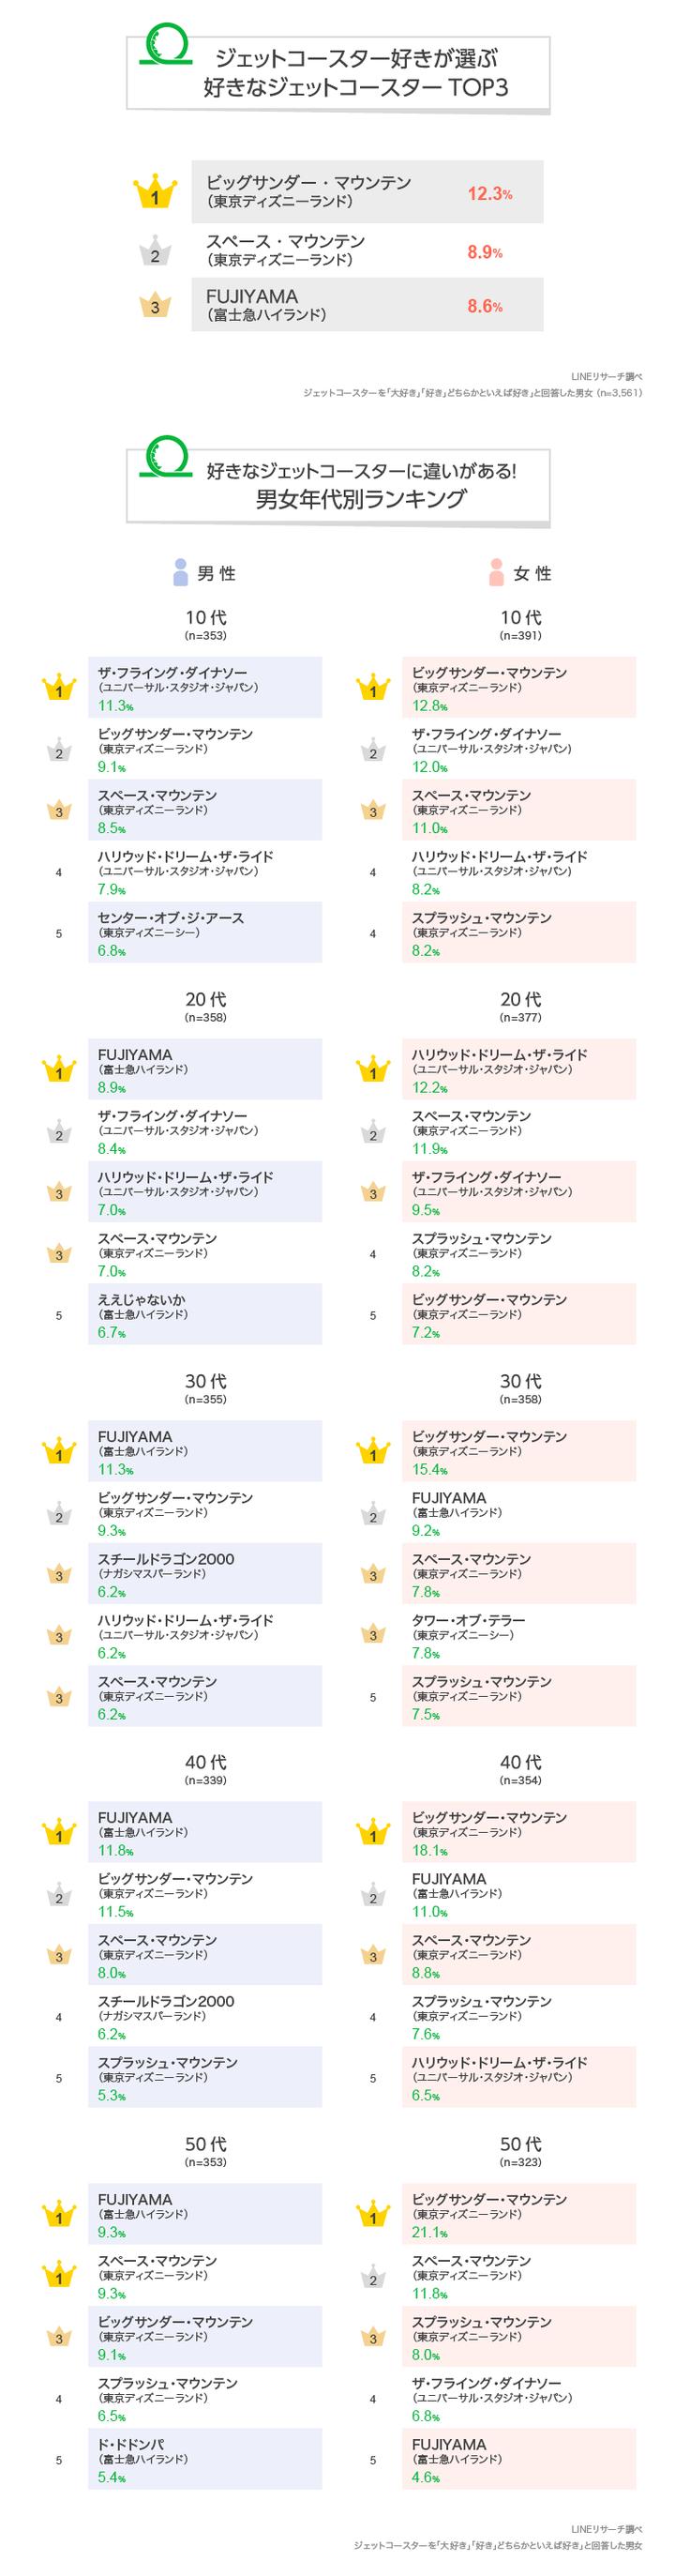 graph_2 (1)